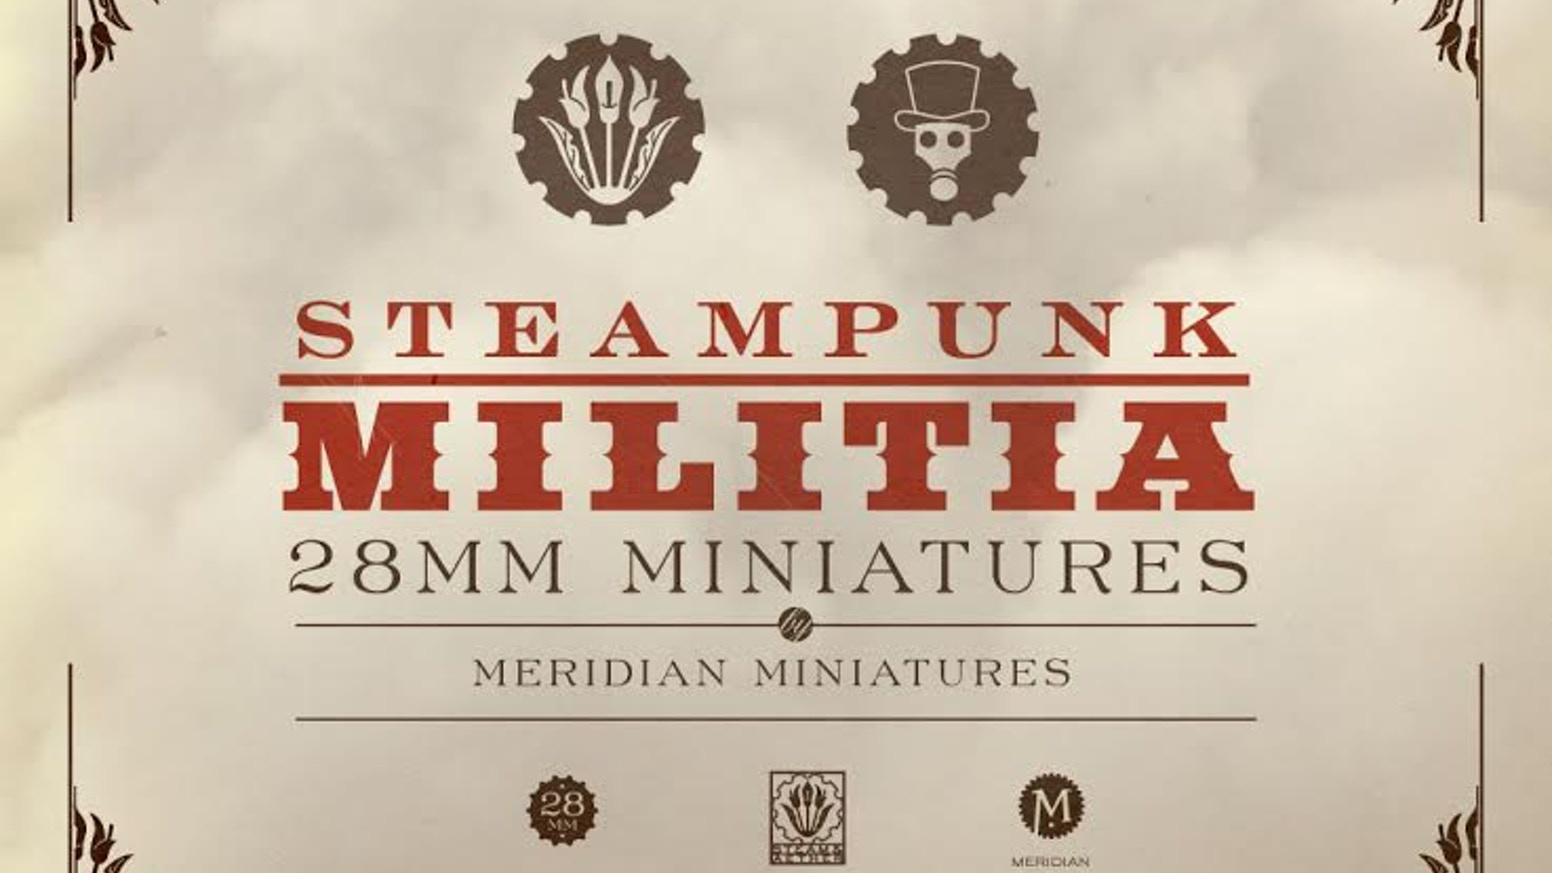 Steampunk Militia Miniatures by Andrew May » Female Militia unlocked